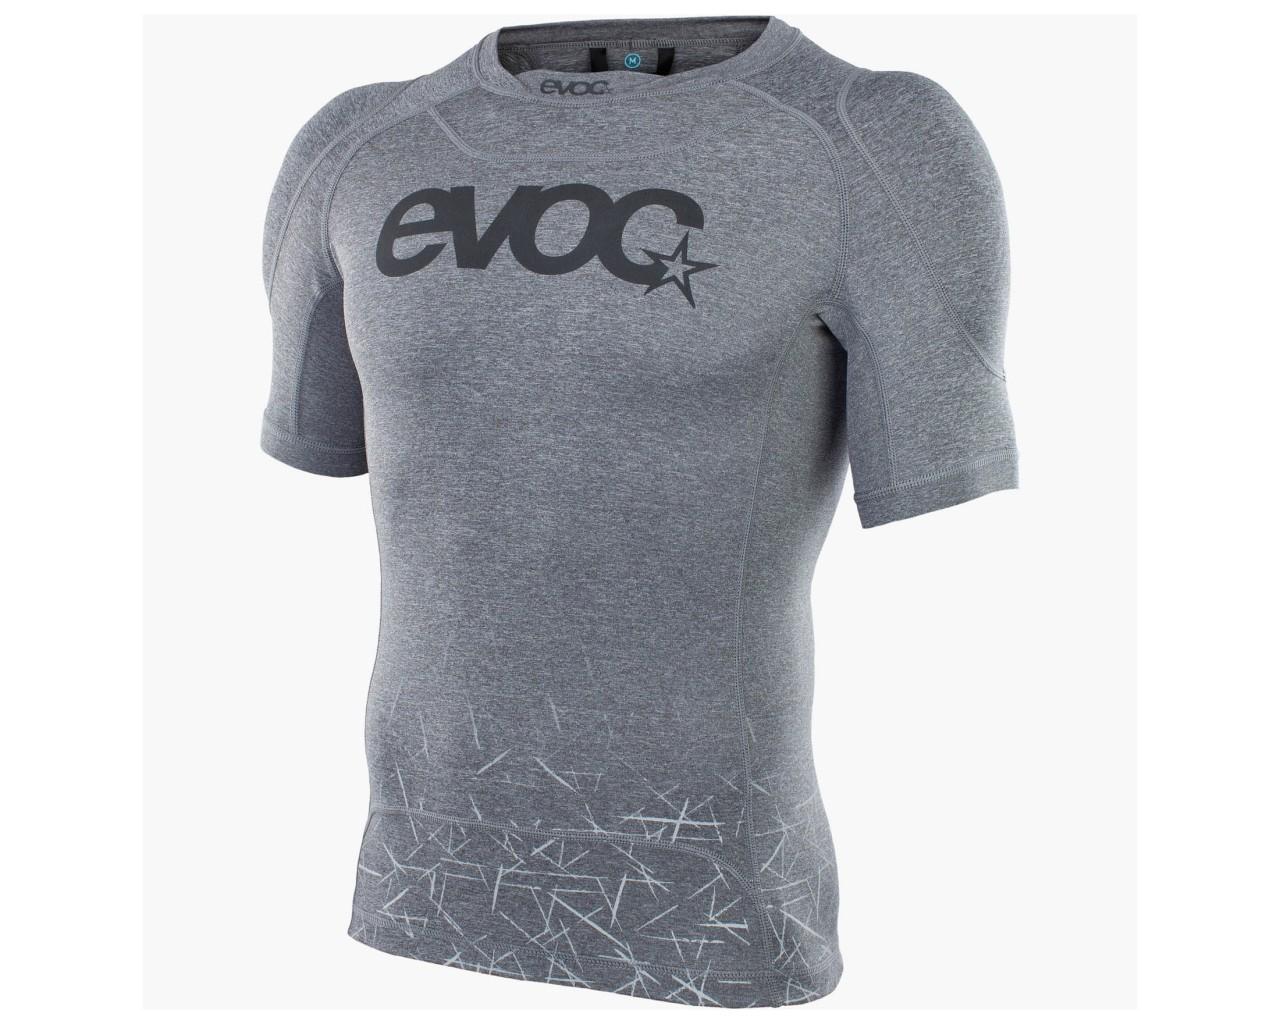 Evoc Enduro Shirt - Baselayer with Shoulder Protectors   grey